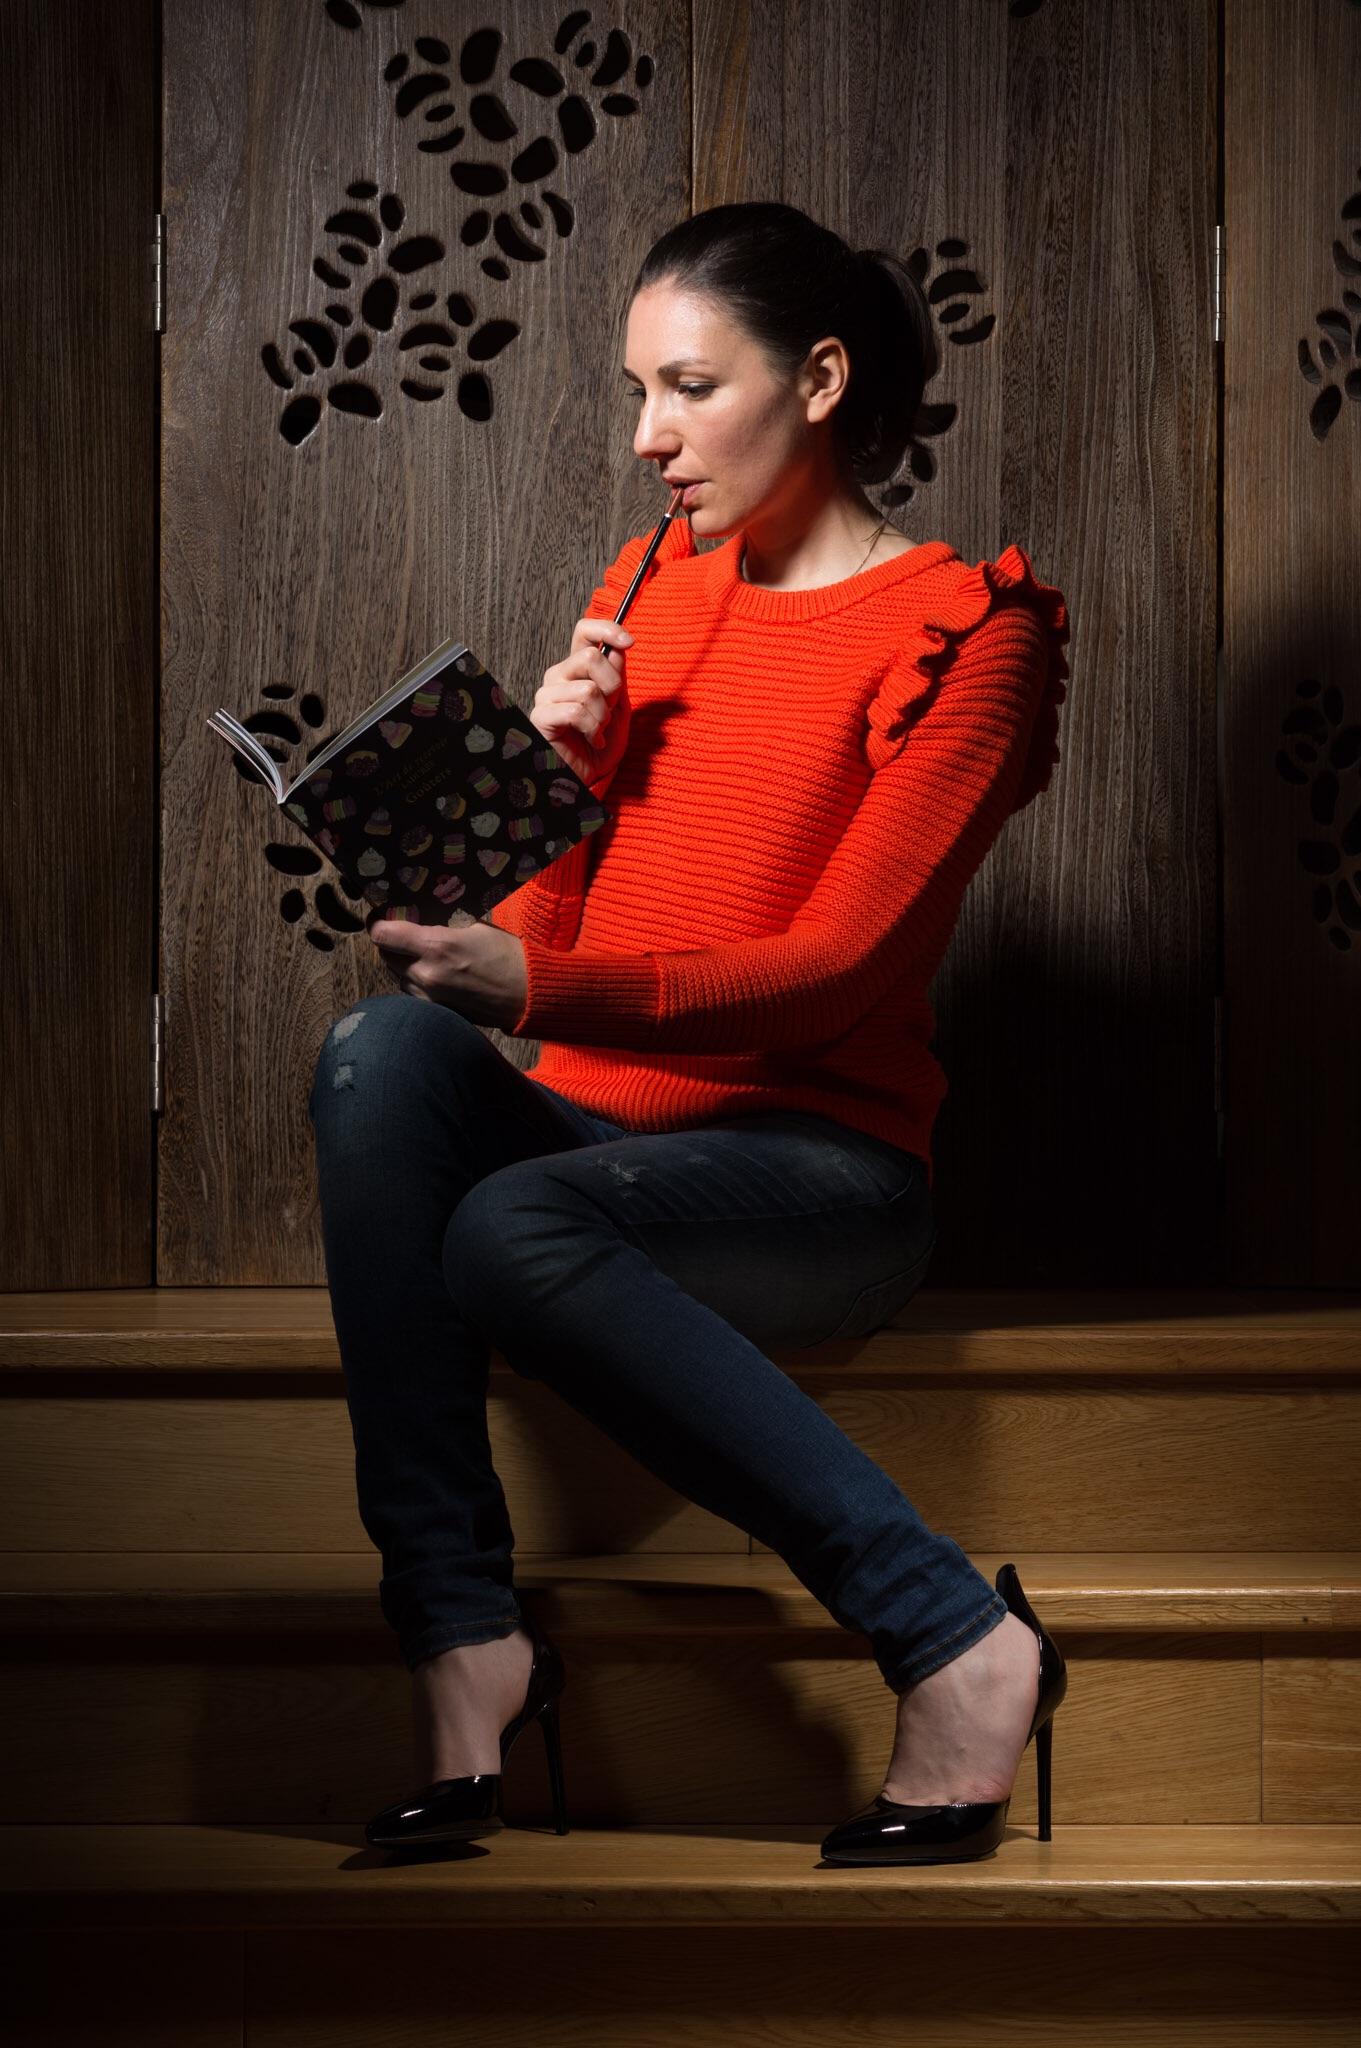 Casual-wear-with-stilettos-3.jpg